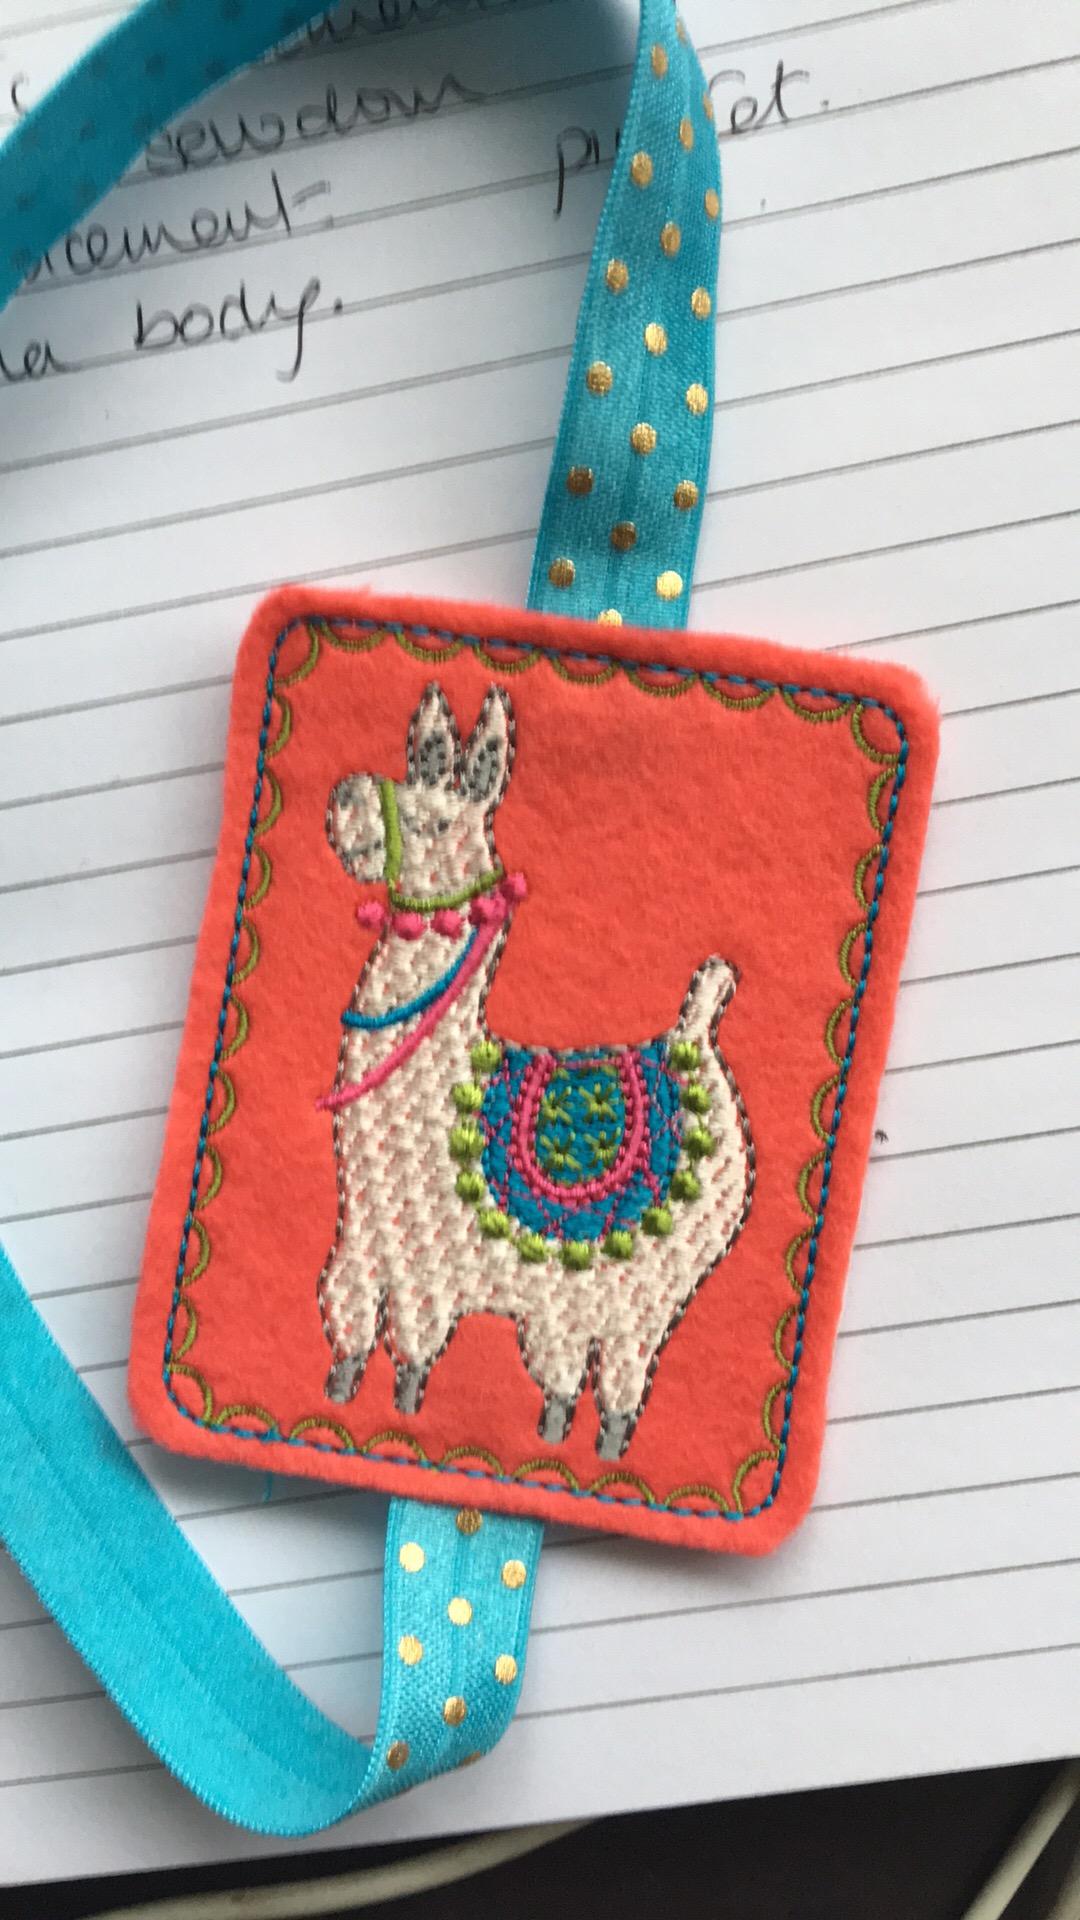 Llama book band machine embroidery design